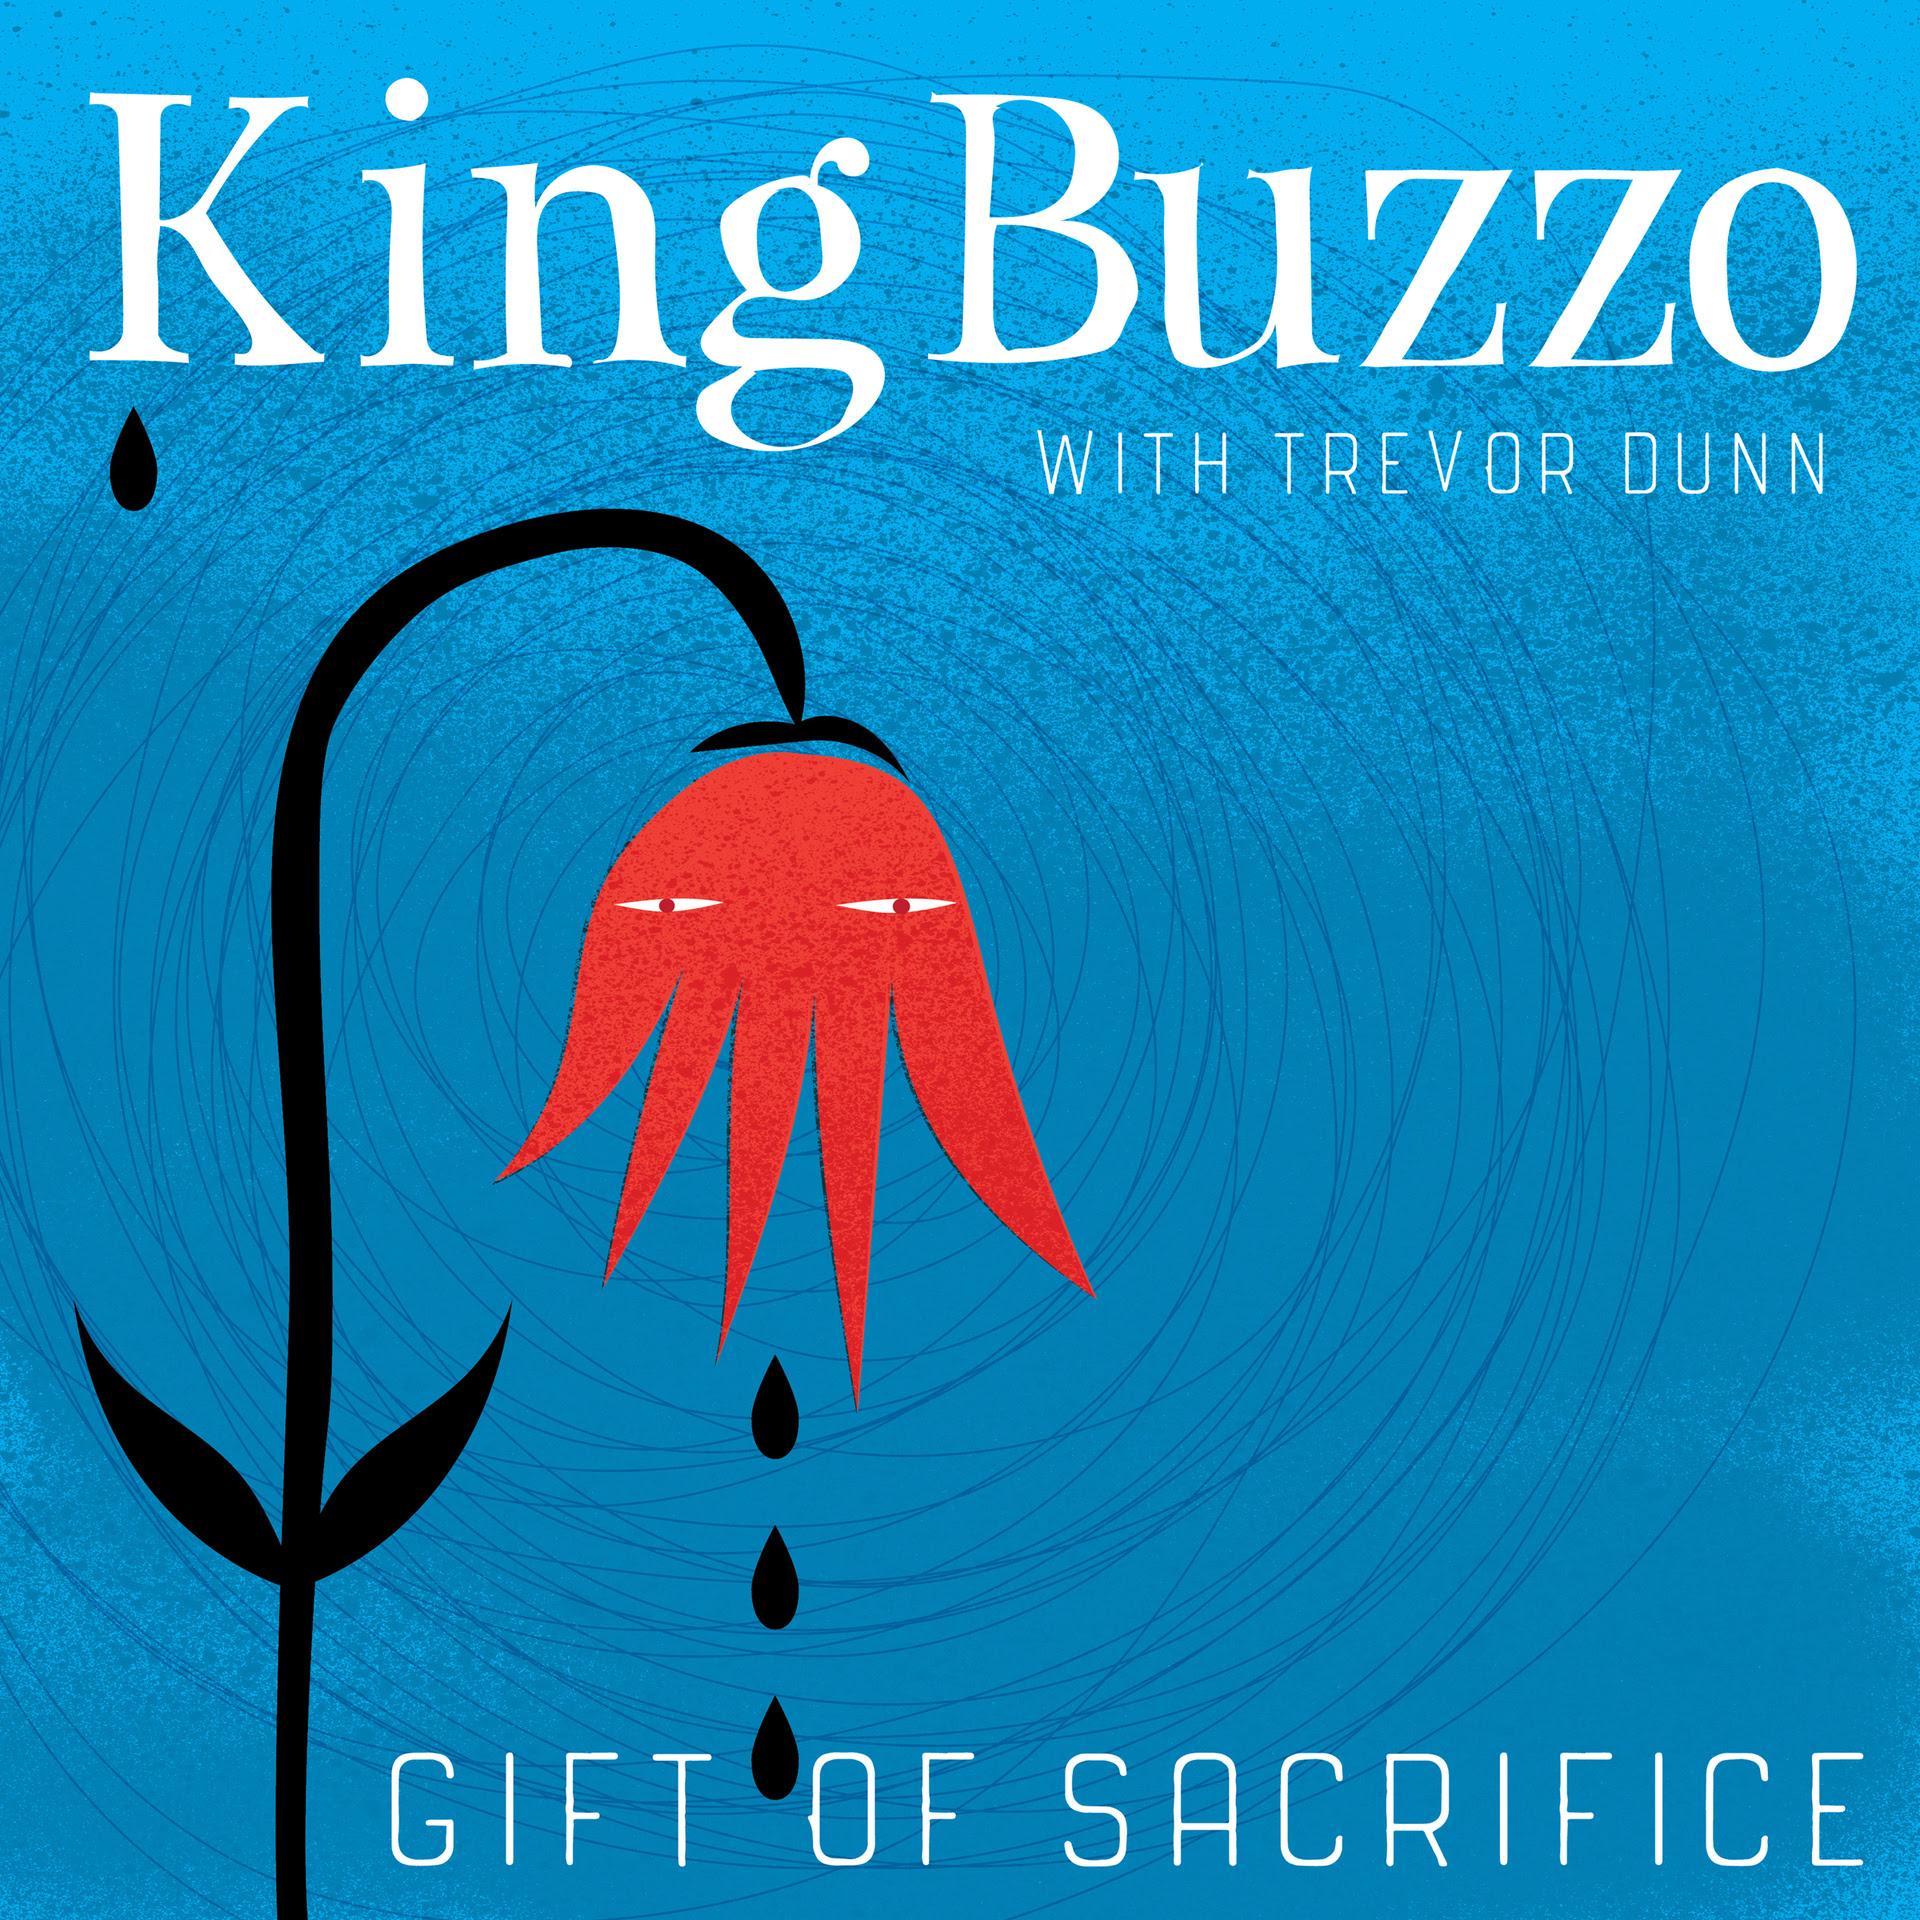 buzz osborne gift of sacrifice